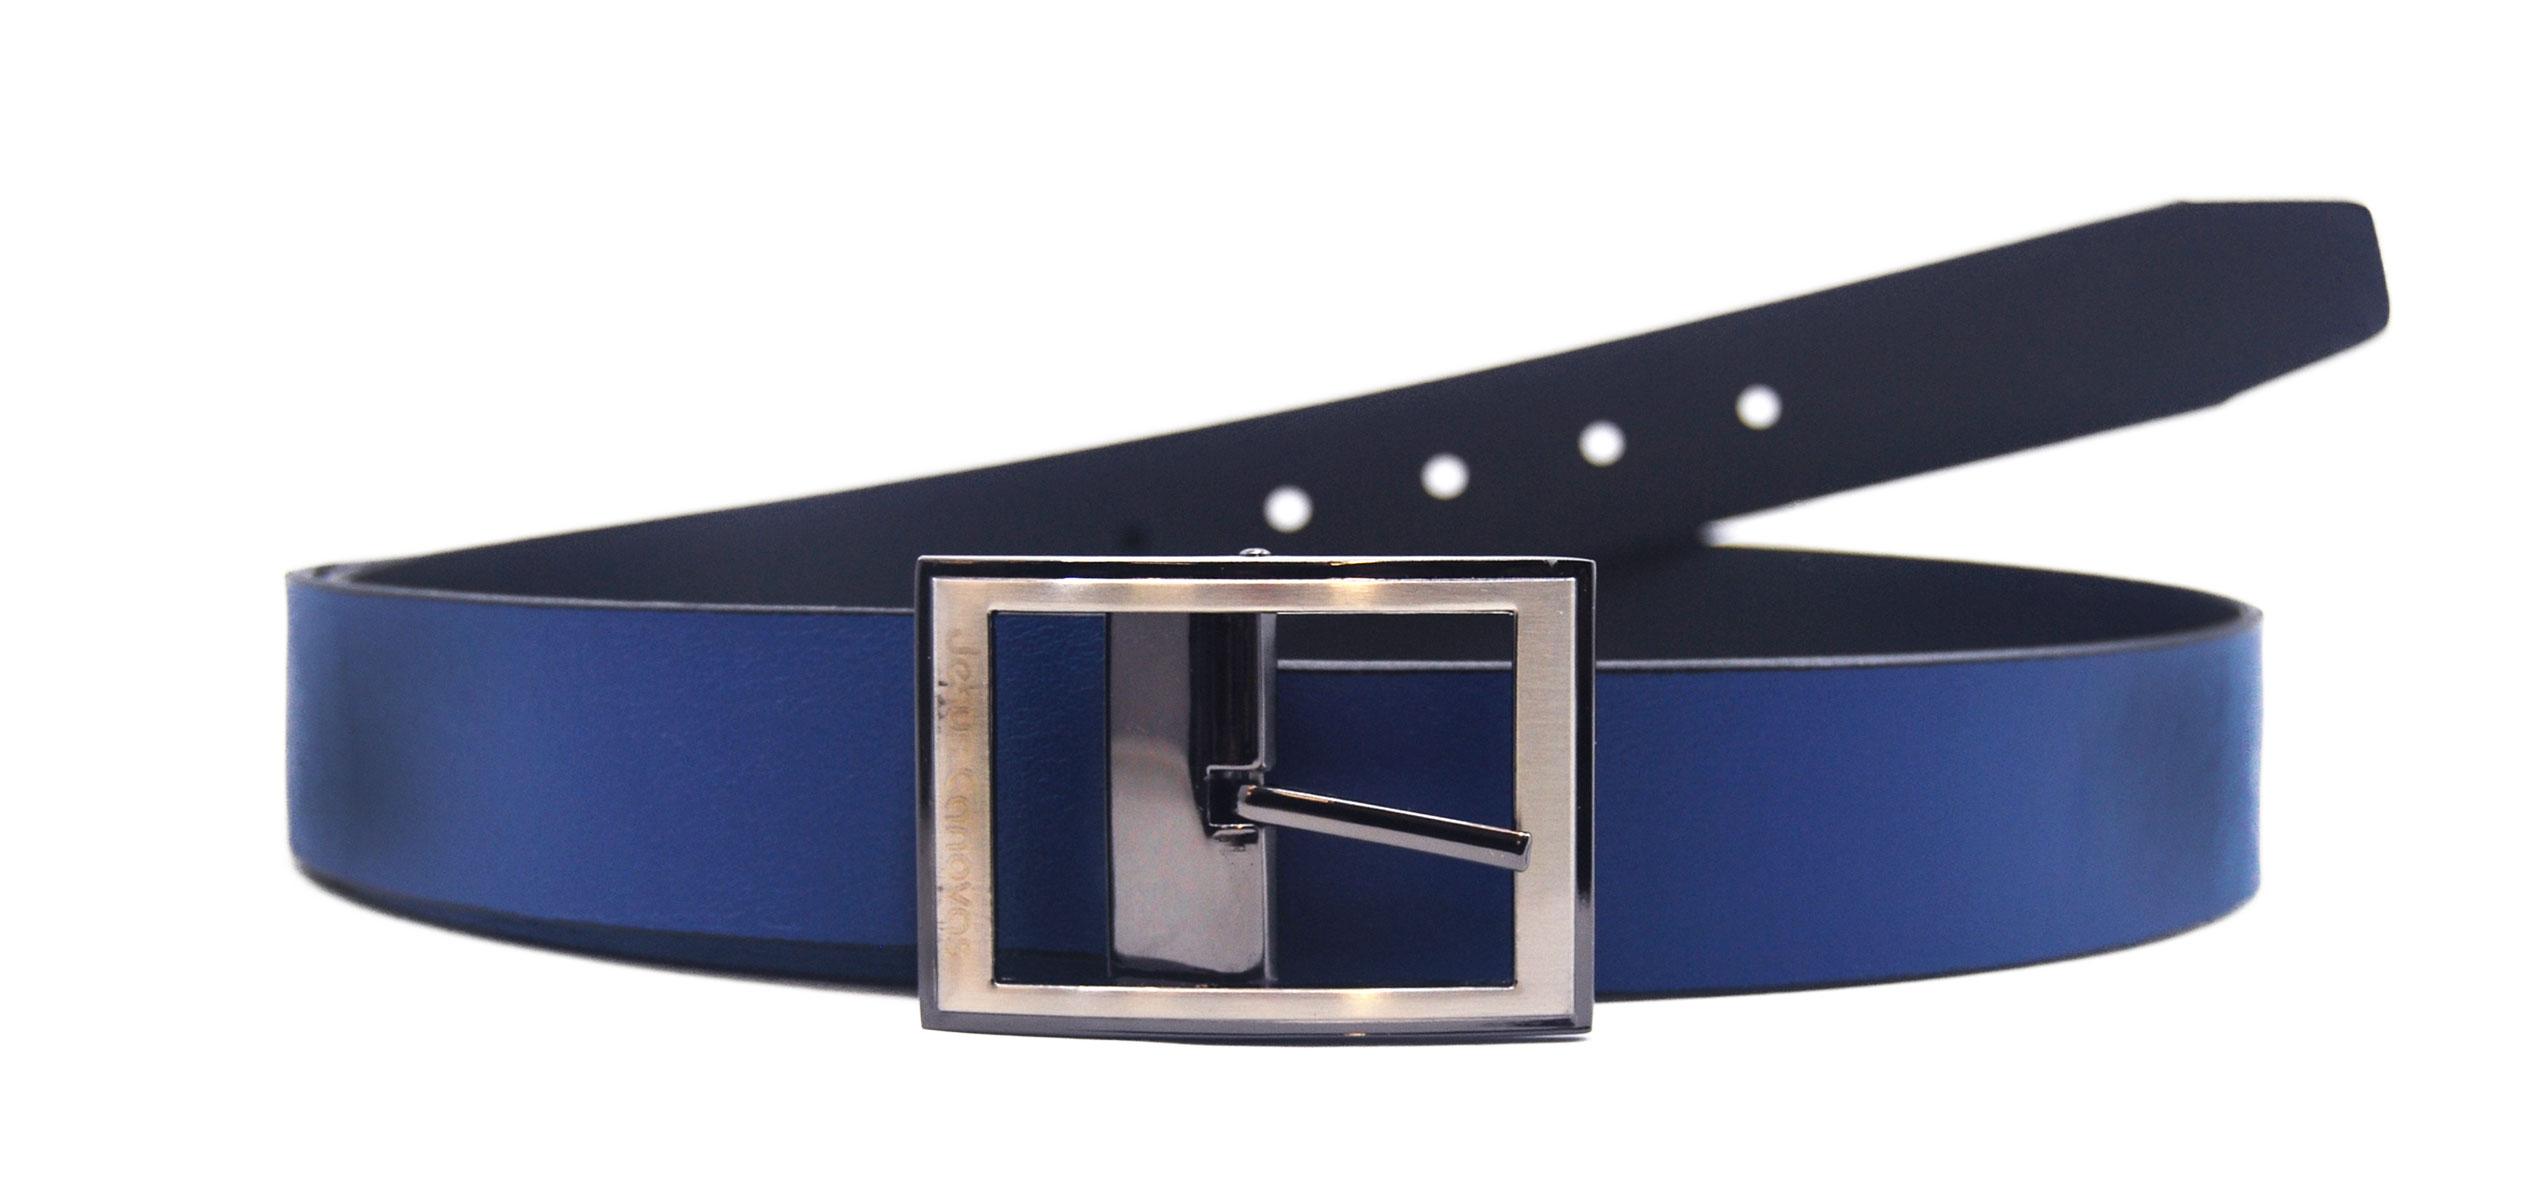 Foto 1 de Cinturón Reversible Azulon